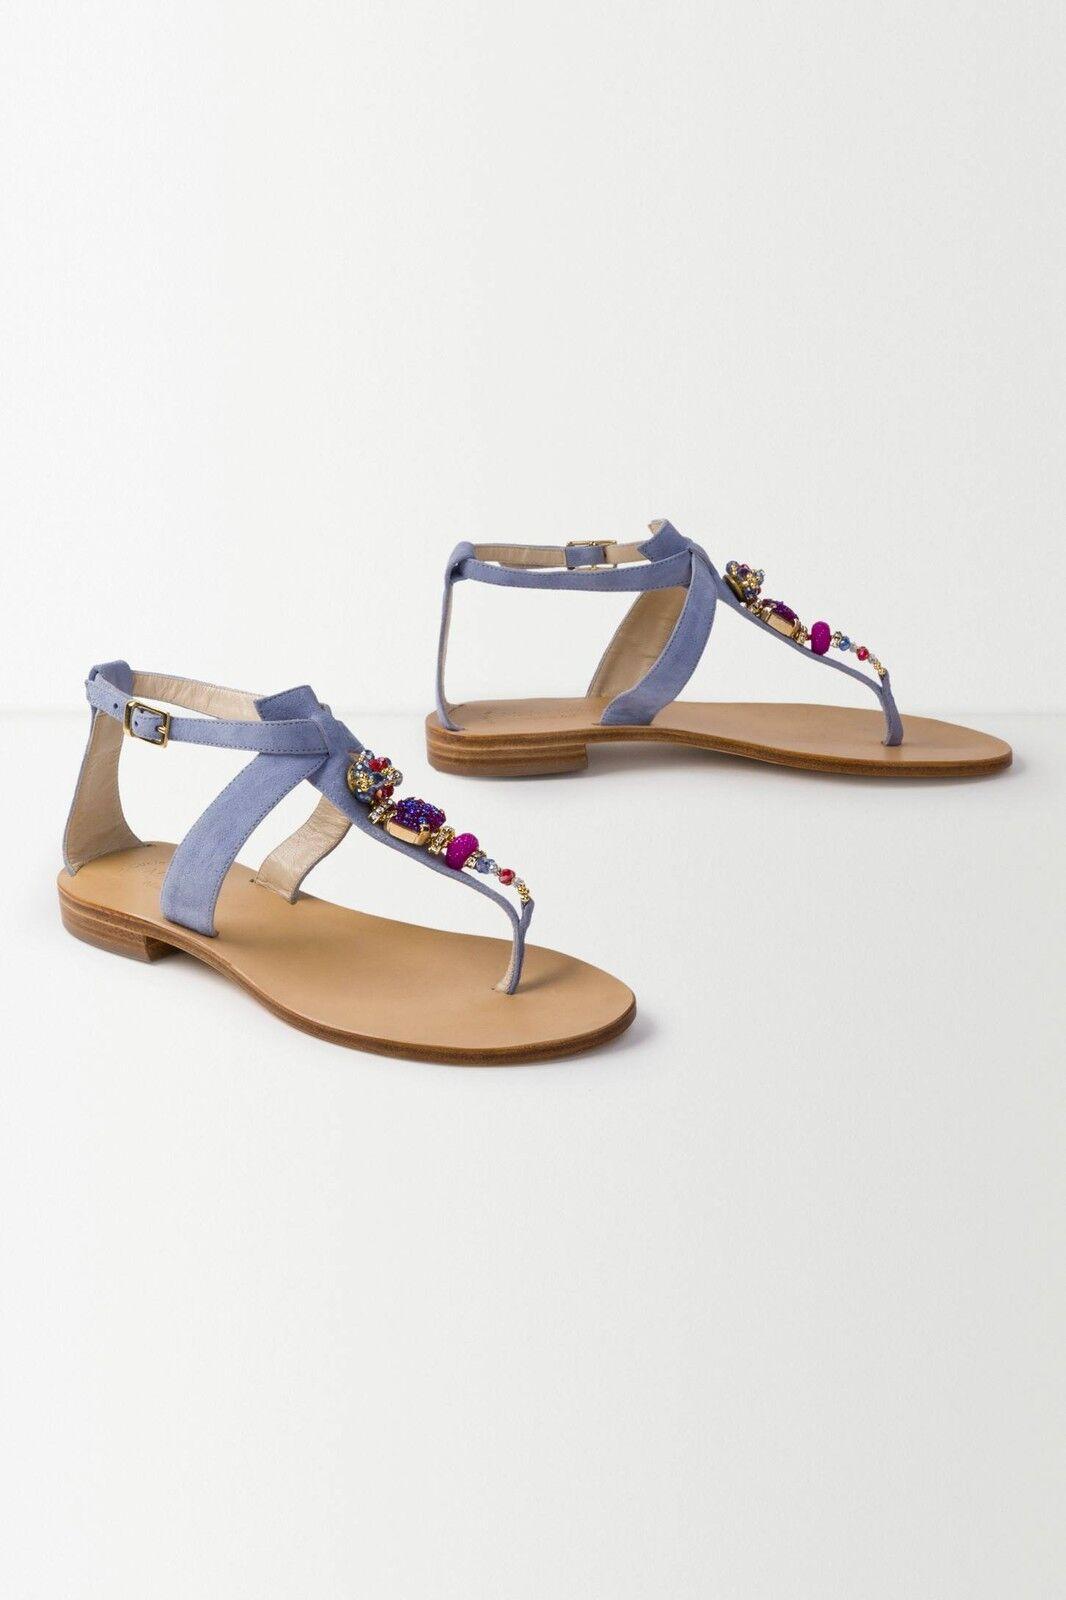 z anthropologie moda marina violetta violetta violetta lilas perles jewel sandales 7 9 40 de daim 76ce0b